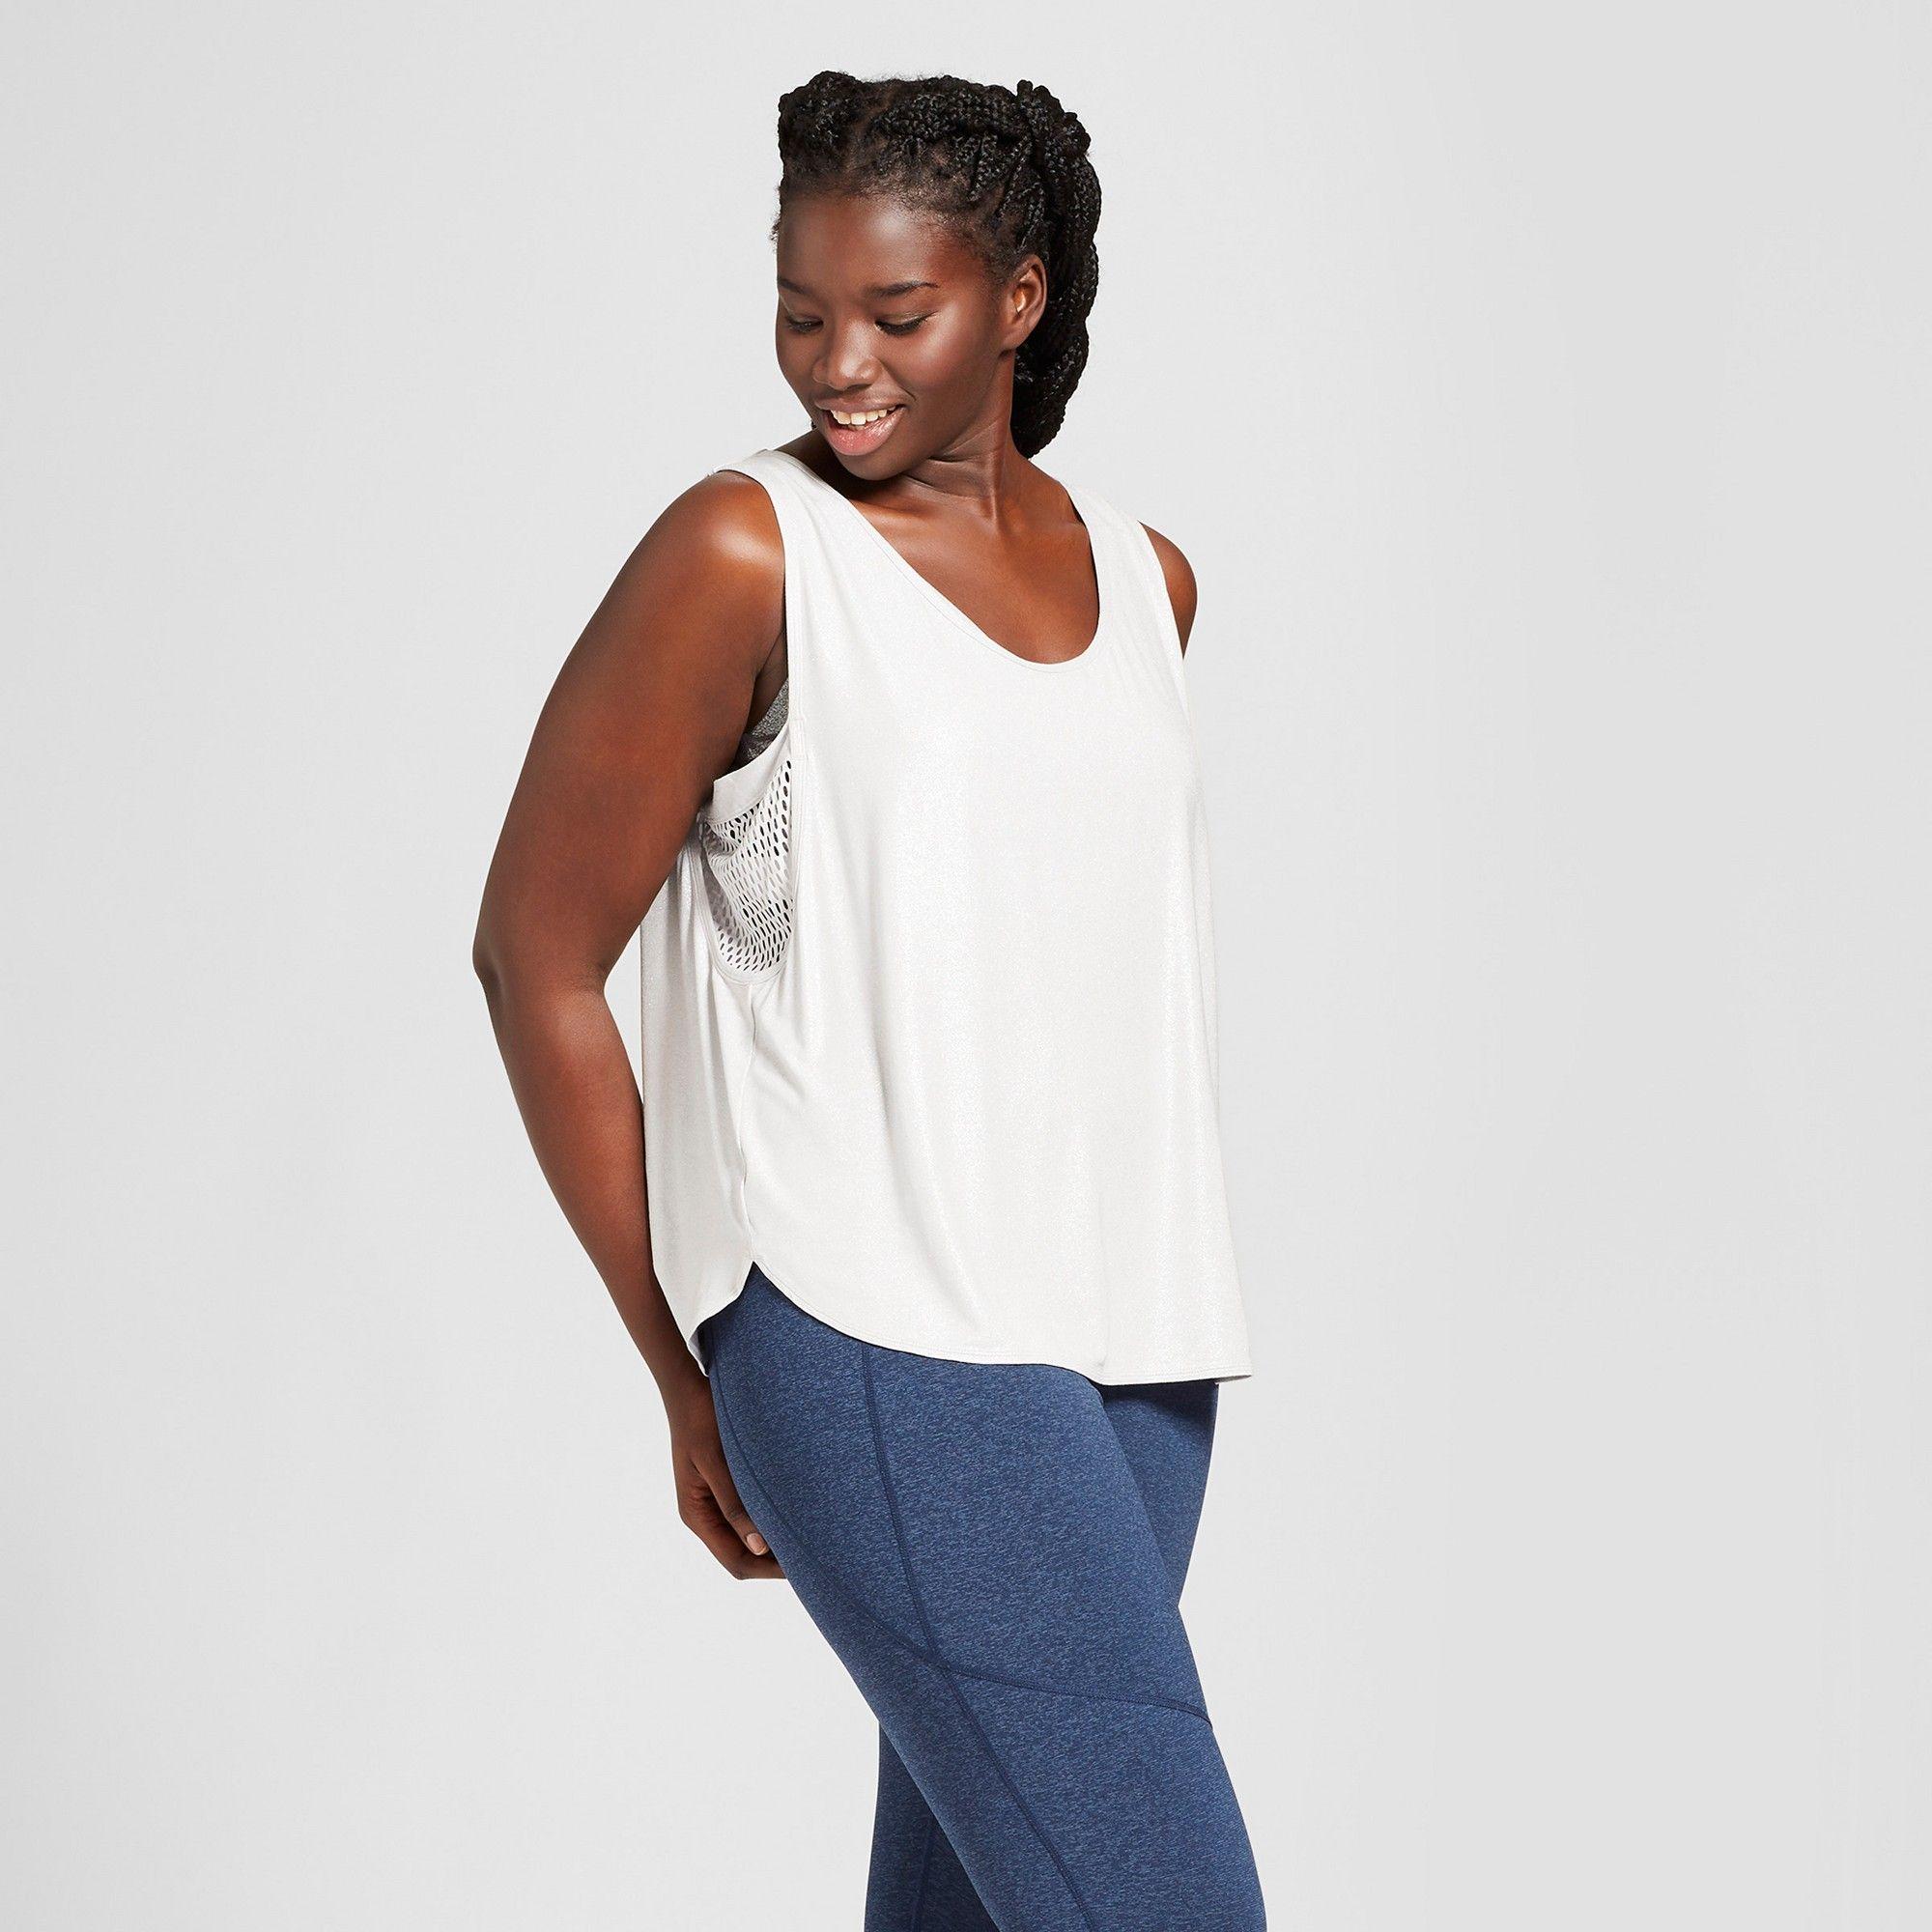 69995fb14 Women's Plus Size Shine Muscle Tank - JoyLab Silver 3X   Products ...